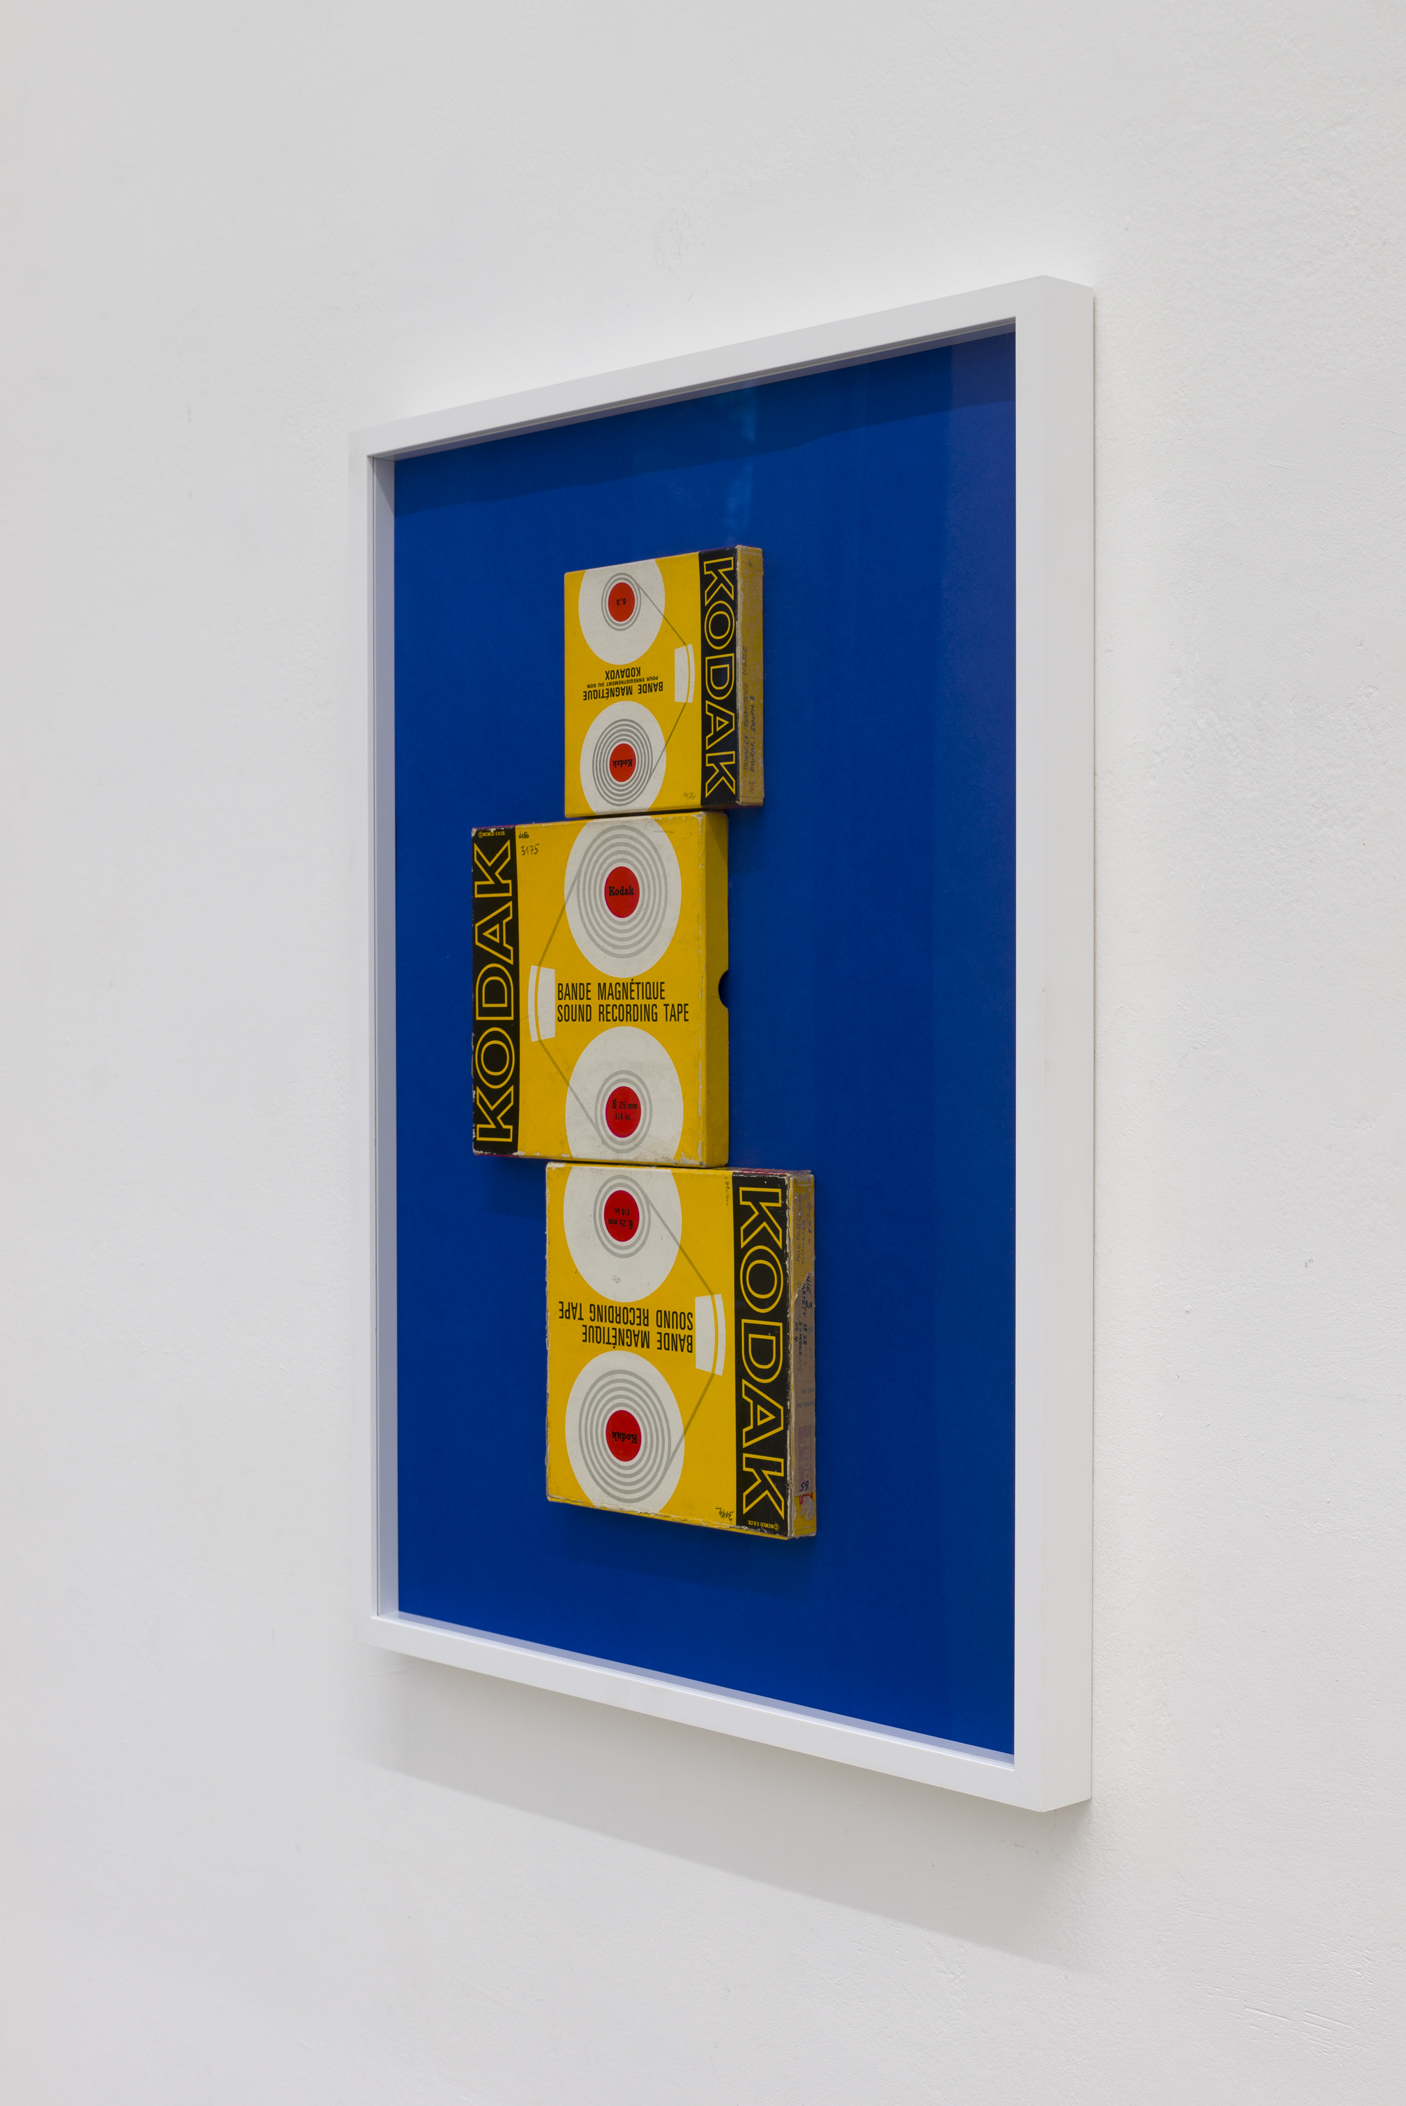 Mladen Bizumic, KODAK (Silent Bank Run), 2018, Kodak 6,25 & 6,3 mm tape sound recording packaging, 2018, Courtesy of the artist & Georg Kargl Fine Arts, Vienna